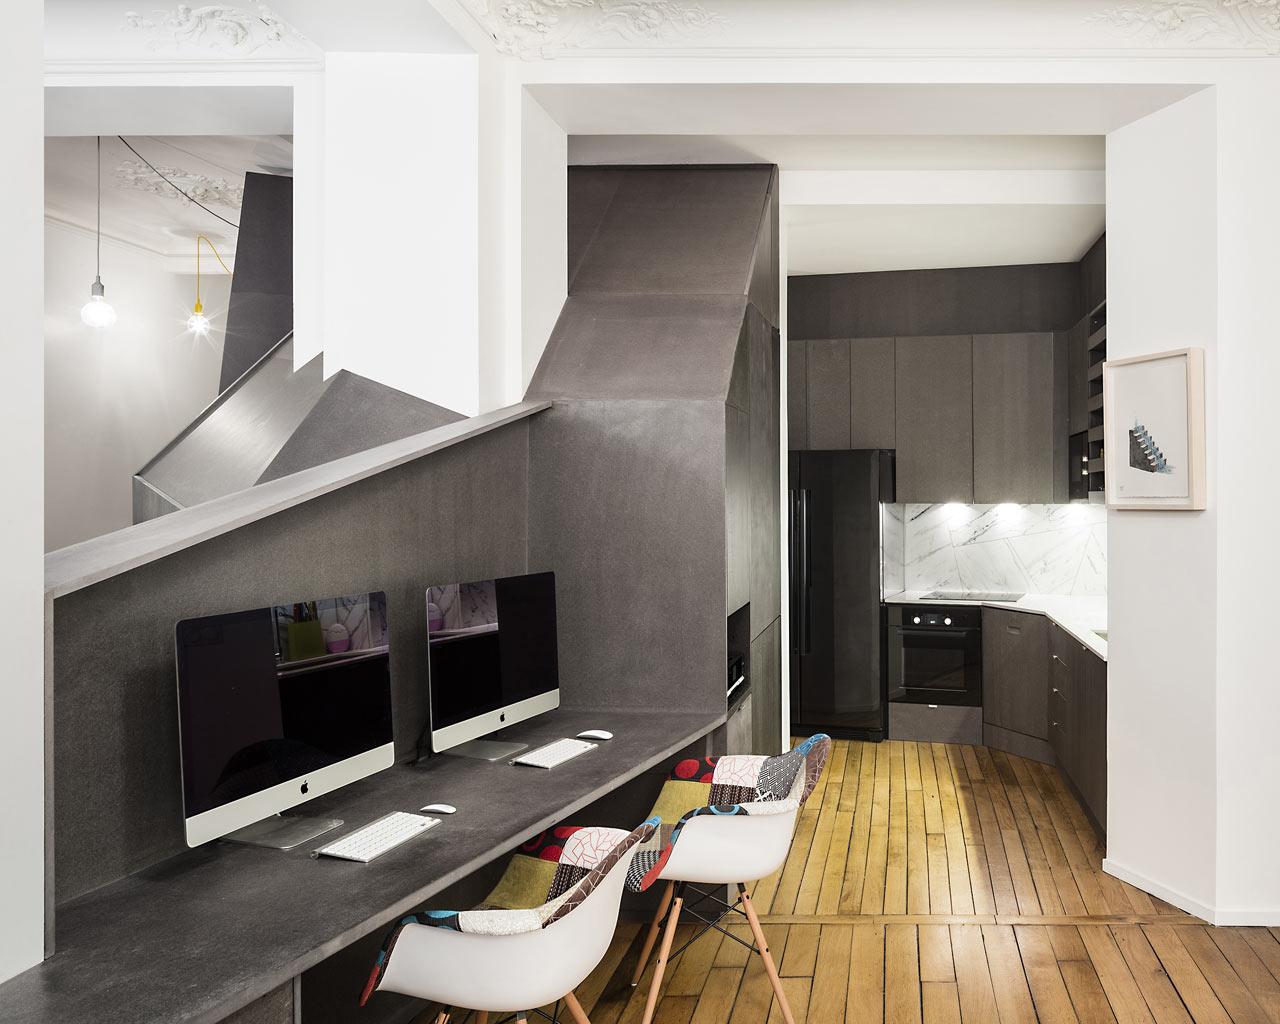 A Classic Parisian Apartment Gets a Geometric Intervention